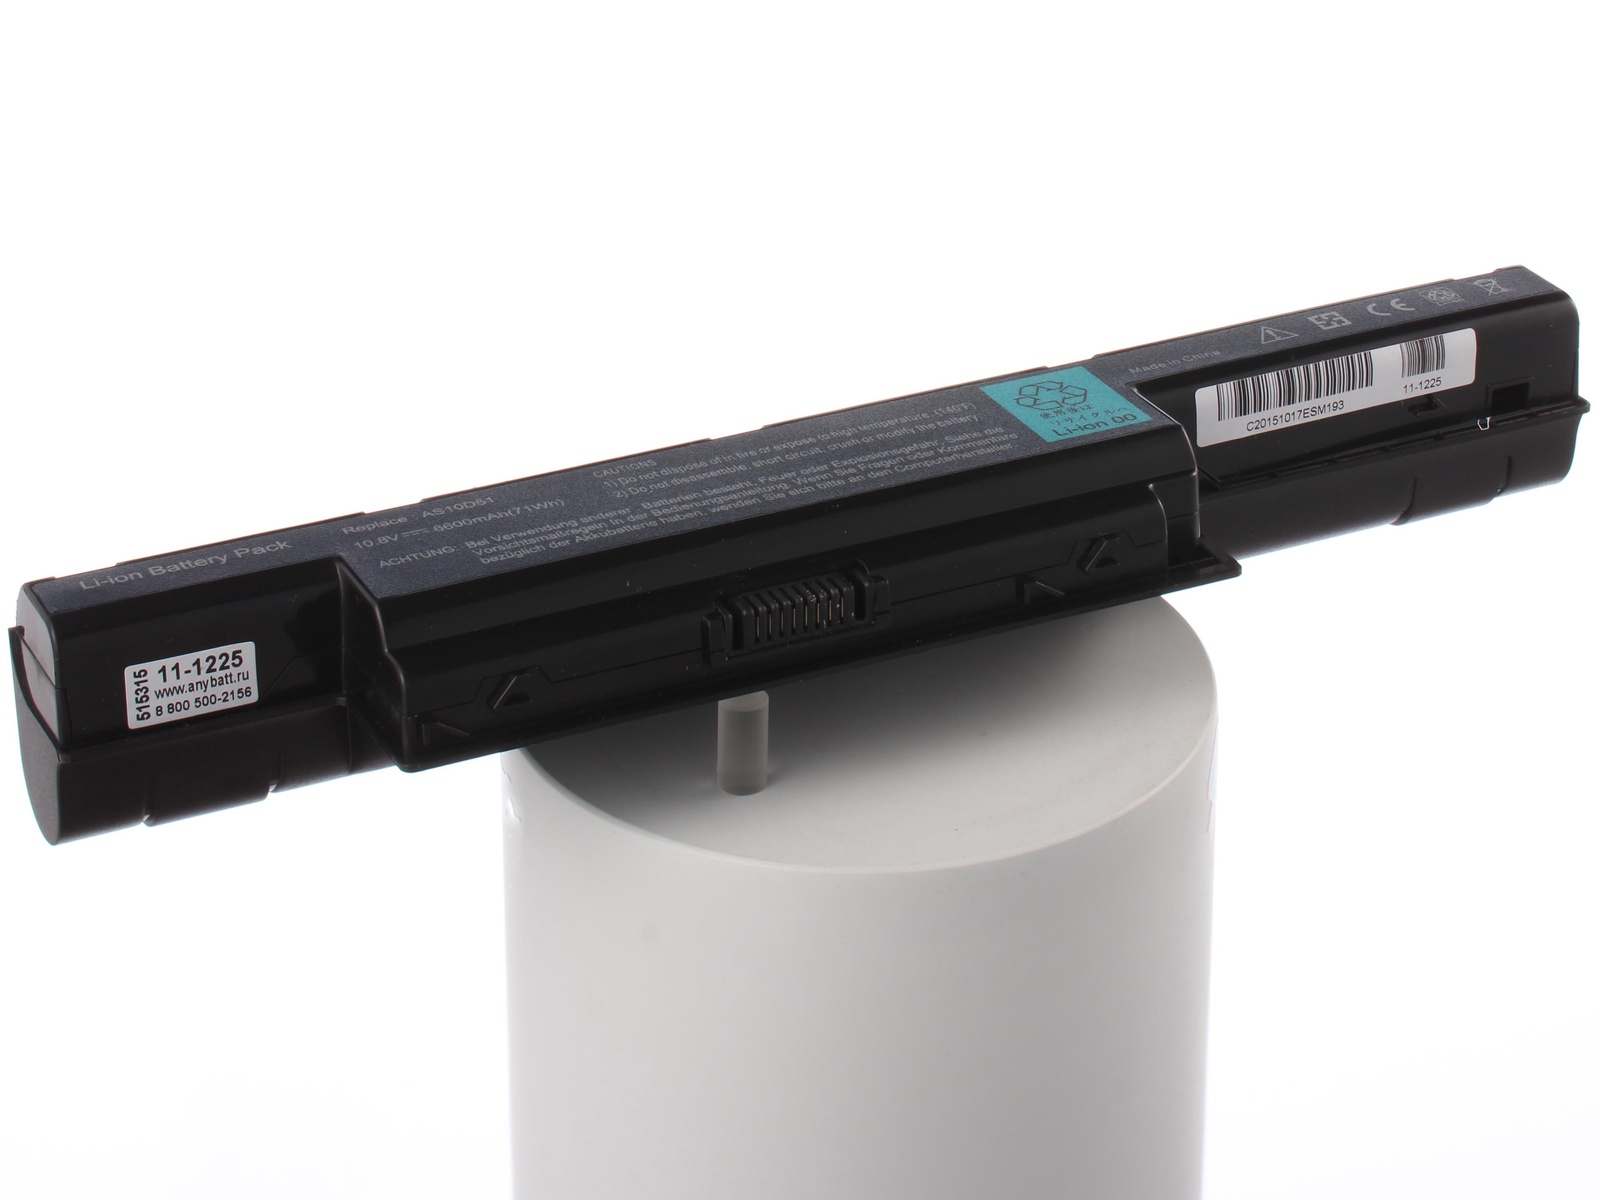 Аккумулятор для ноутбука AnyBatt для Acer Aspire V3-771G-73618G75Makk, eMachines E642G-P543G32Mikk, eMachines E732ZG-P622G32Mikk, eMachines E732ZG-P623G50Mnkk, eMachines G730G-382G32Miks, TravelMate 7750Z, Travelmate P653-M монитор emachines e220hqv